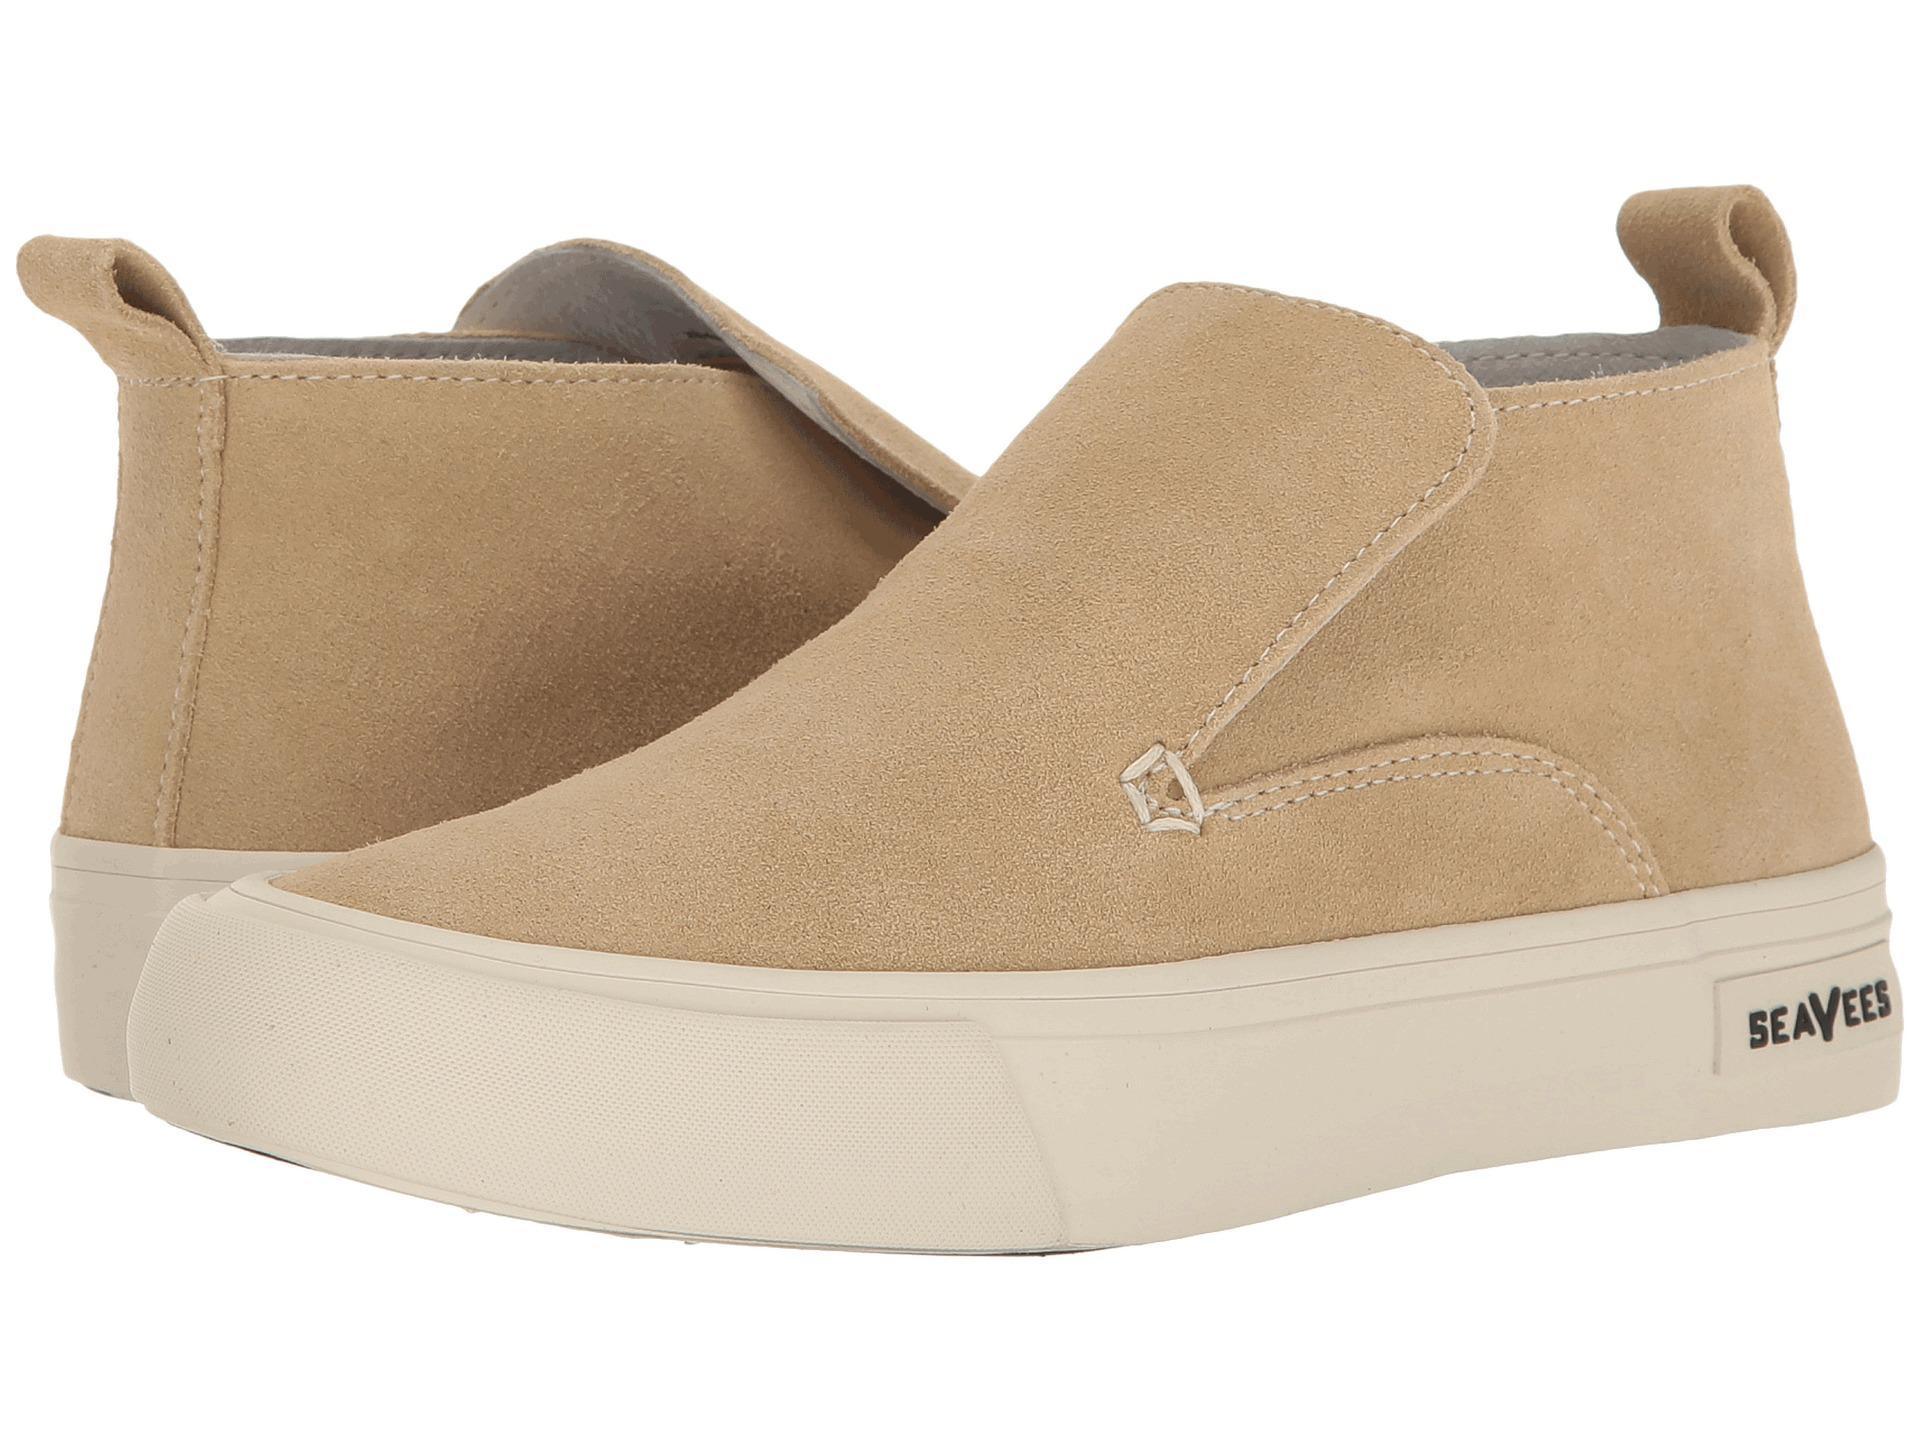 Seavees Women S Shoes